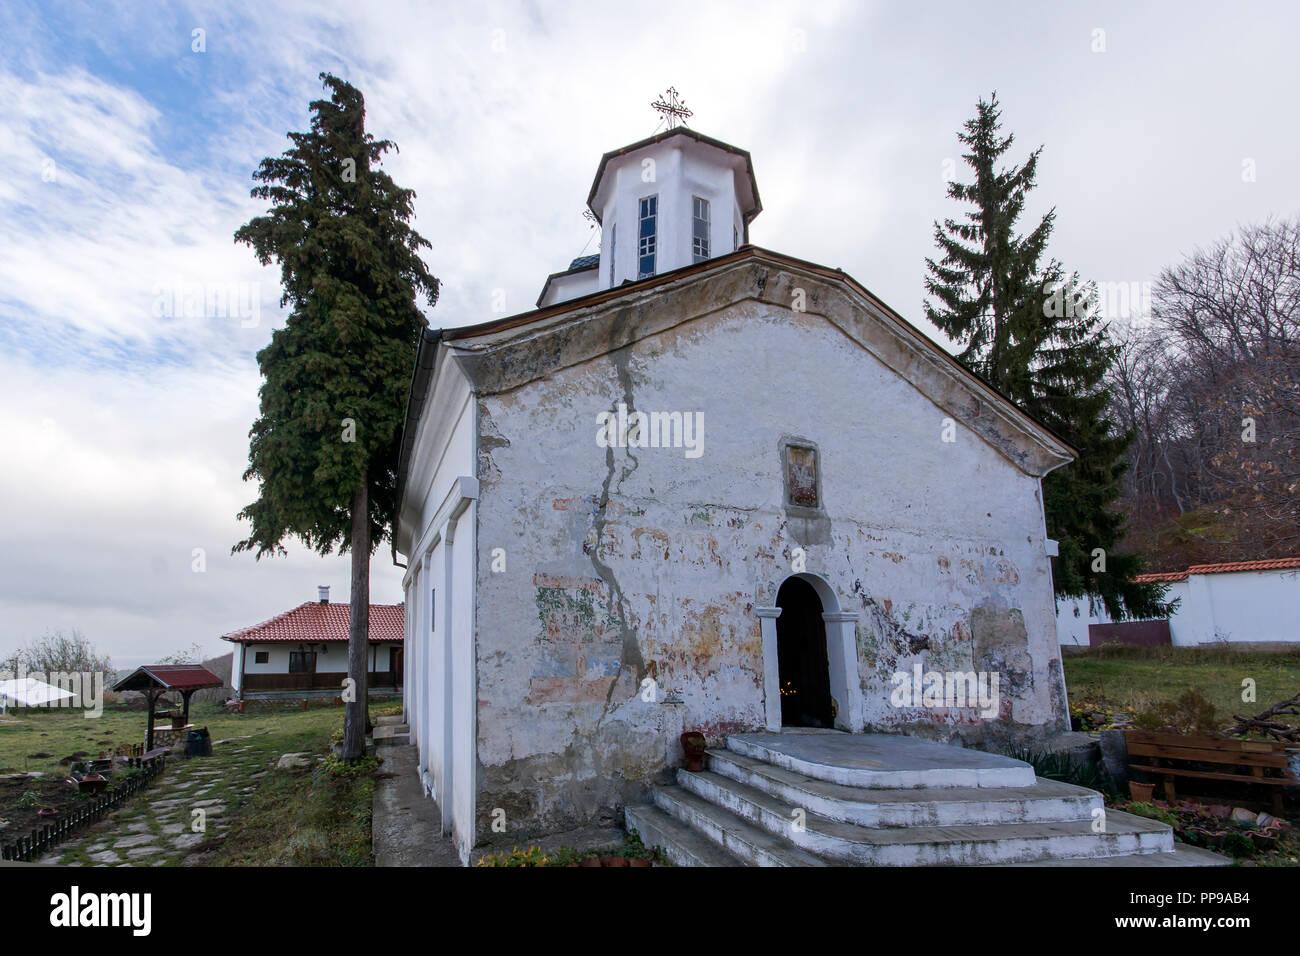 Medieval Lozen Monastery of Holy Savior (Sveti Spas), Sofia City region, Bulgaria - Stock Image